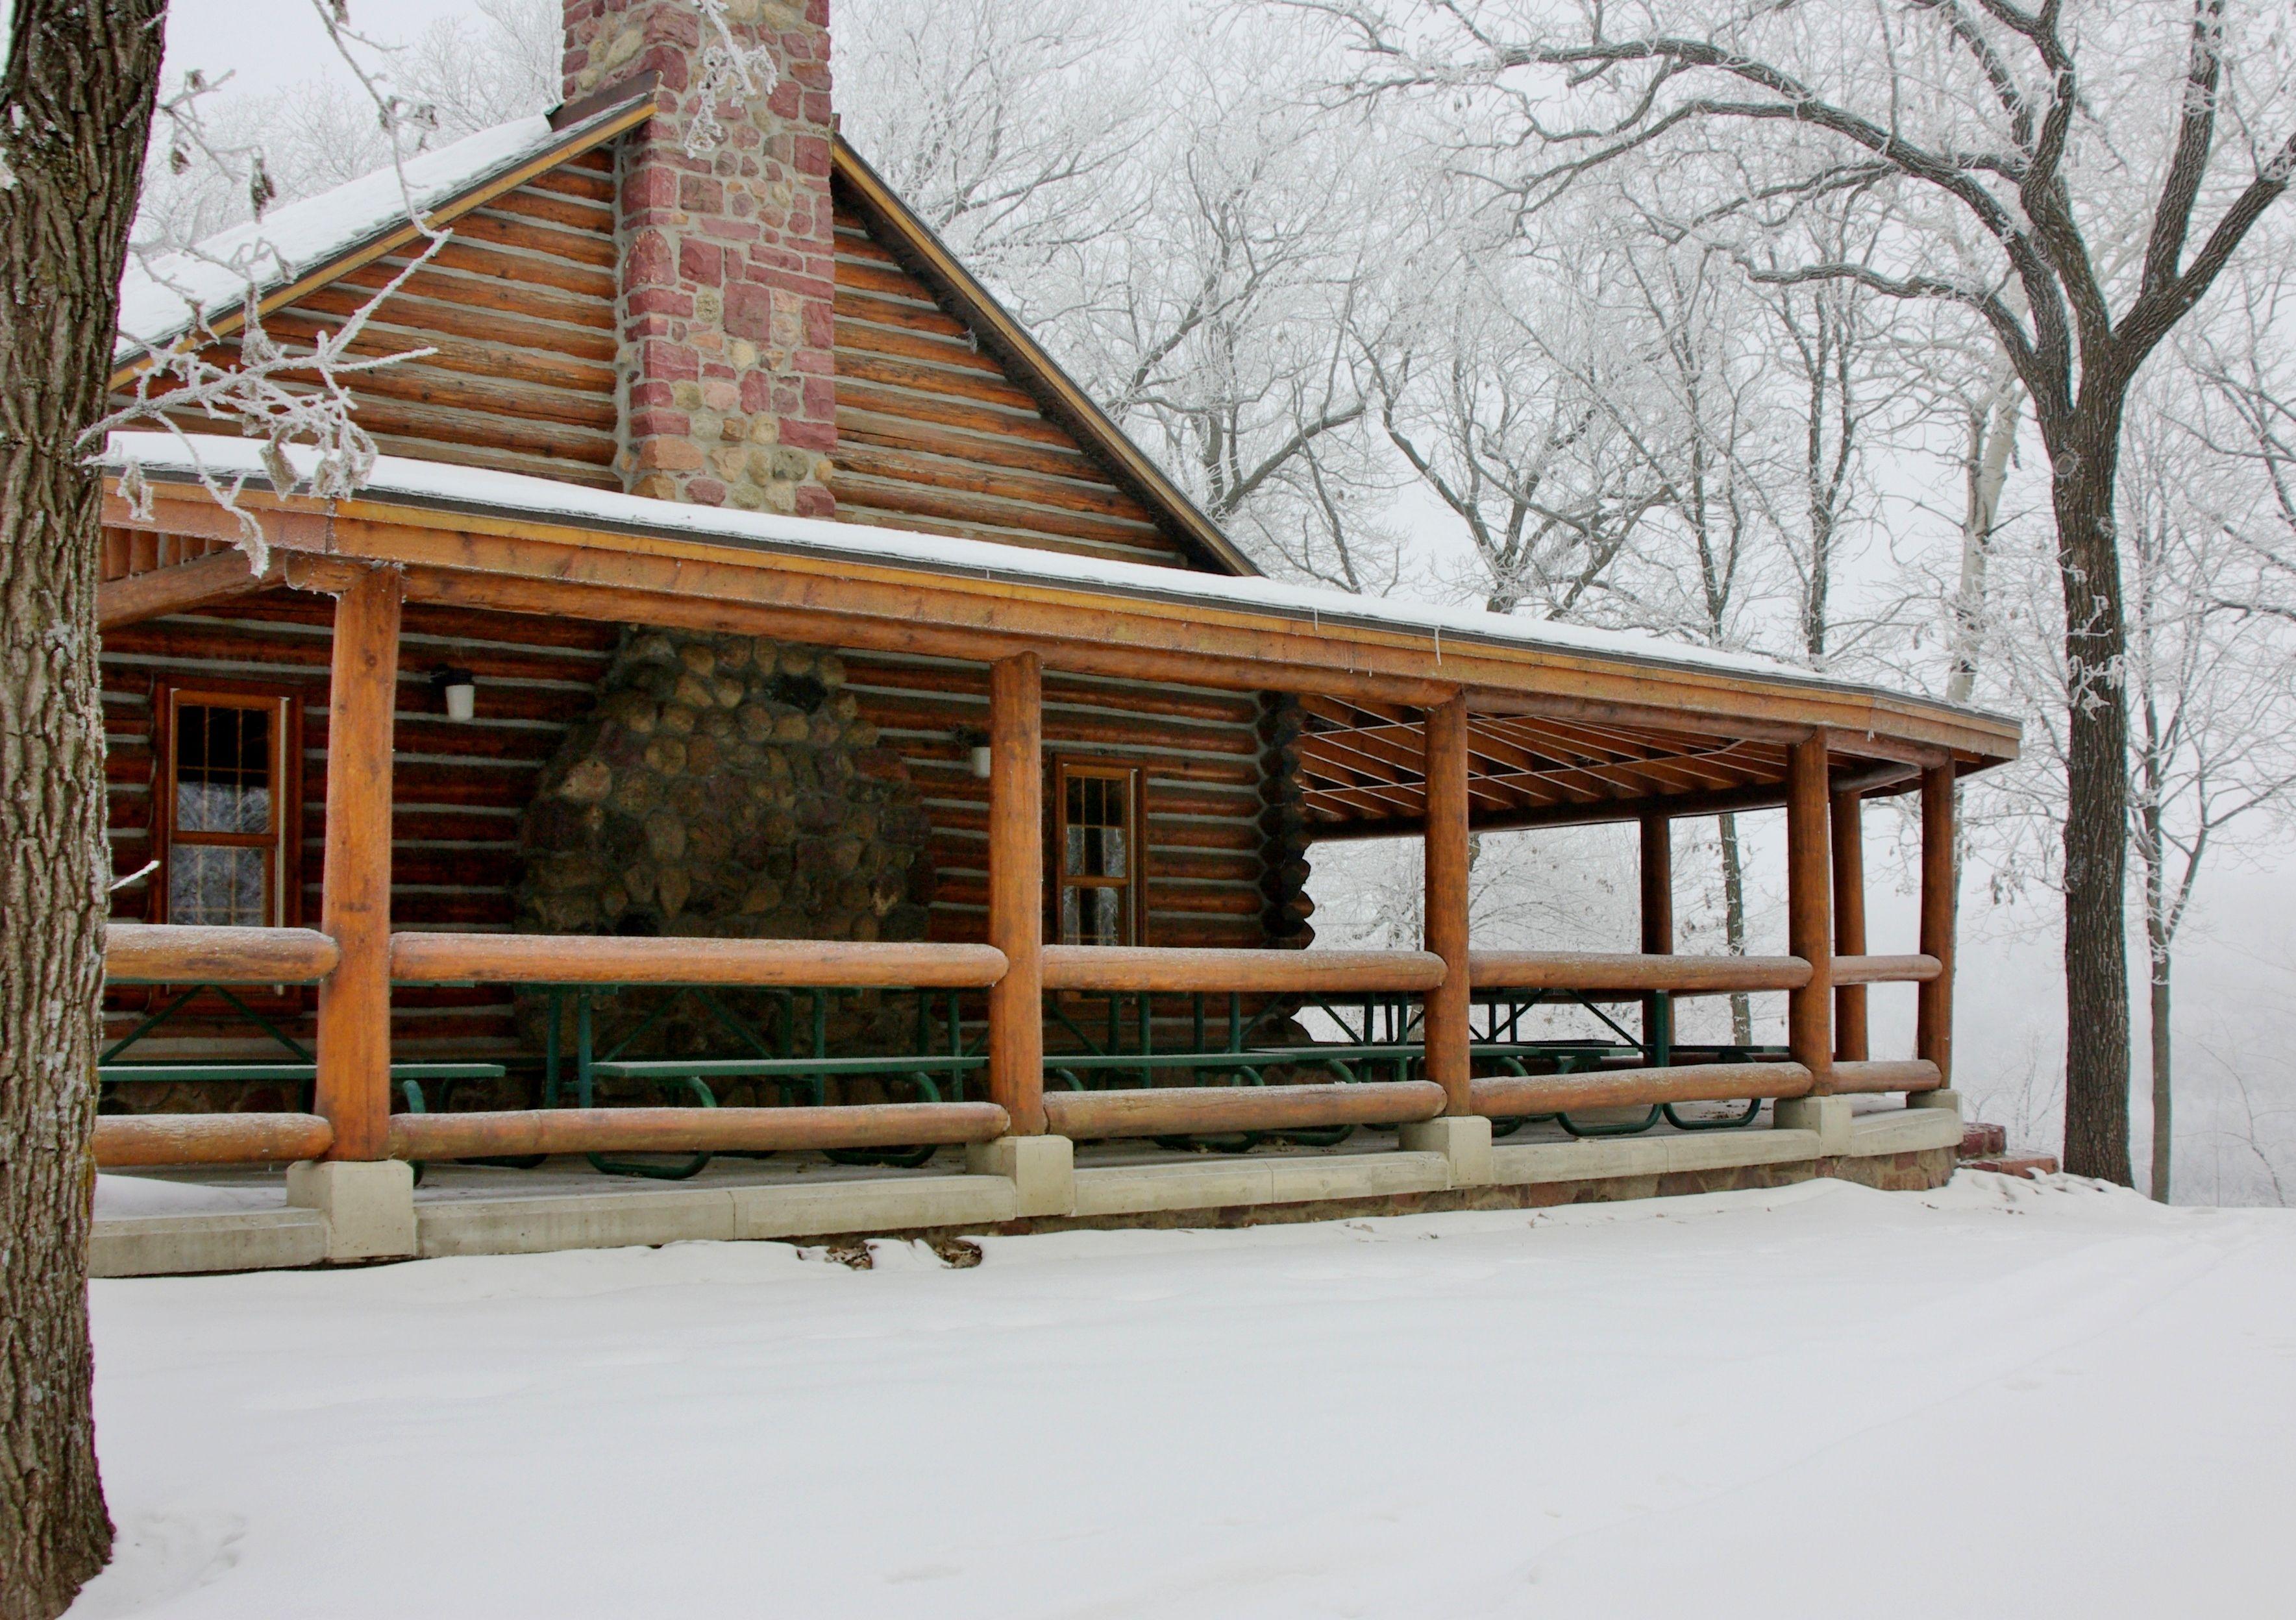 rentals park cabins the arnolds life okoboji property cabin